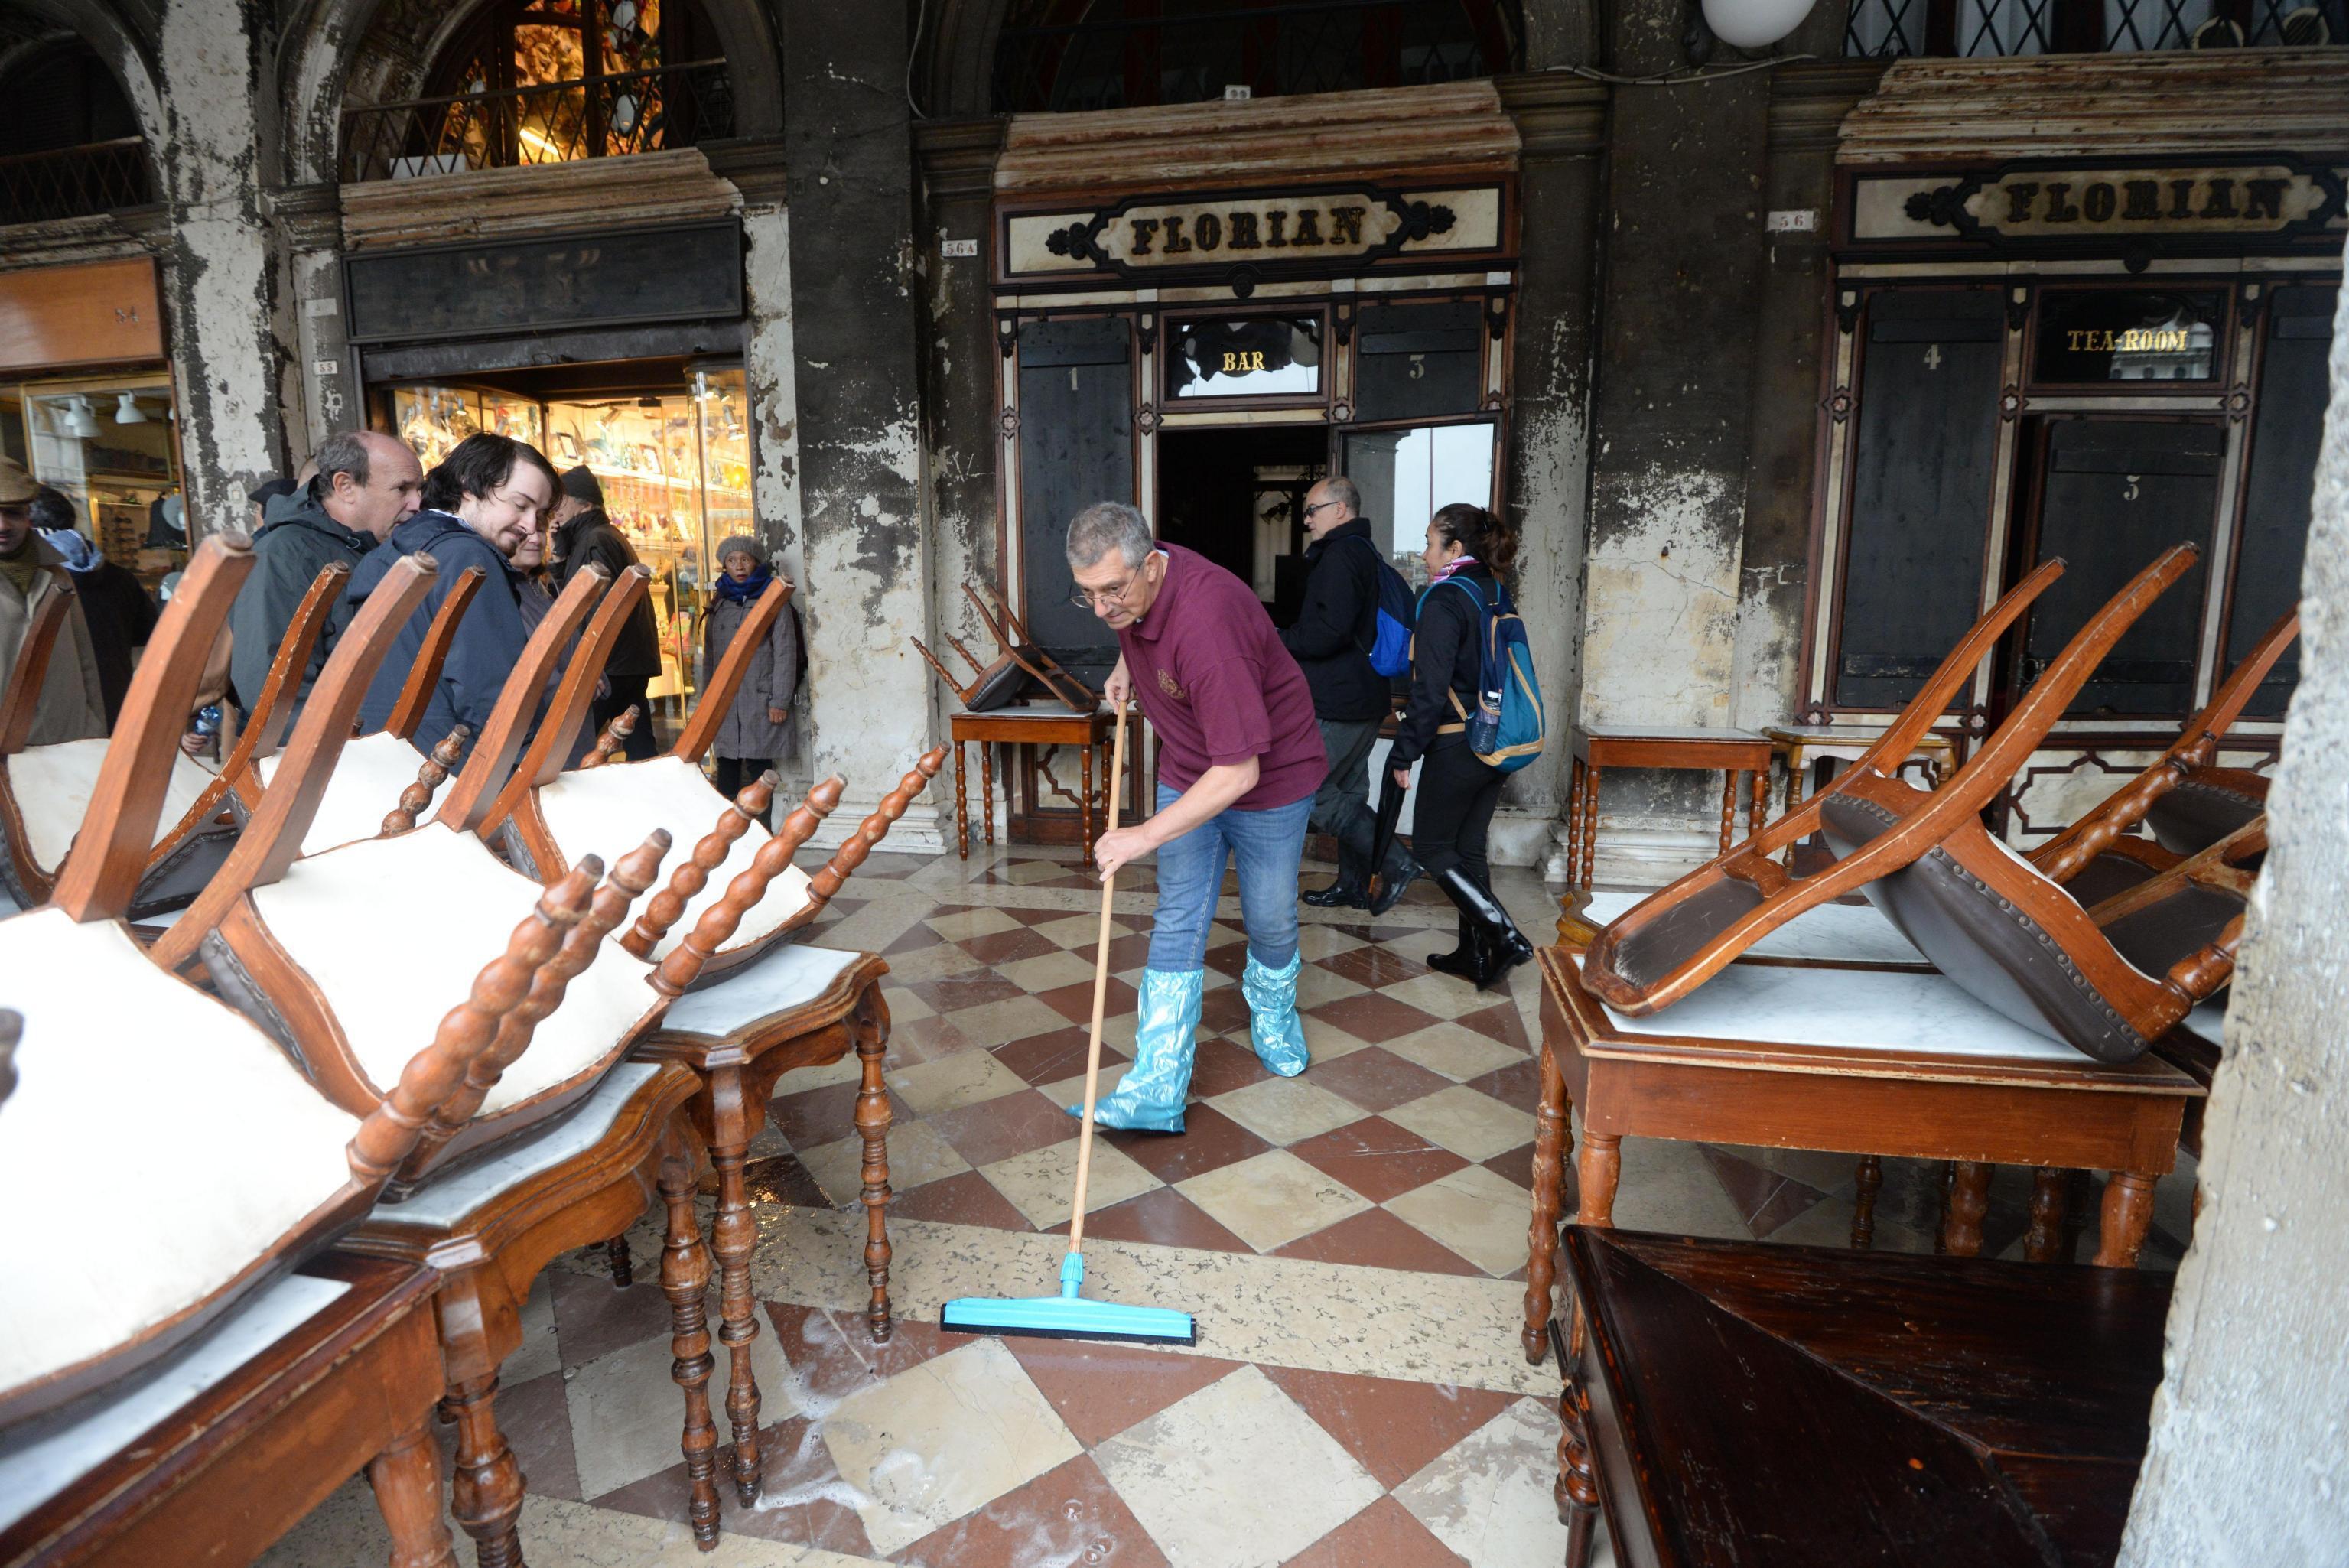 FOTO Cambio climático, causa de marea récord en Venecia, dice alcalde (AP)